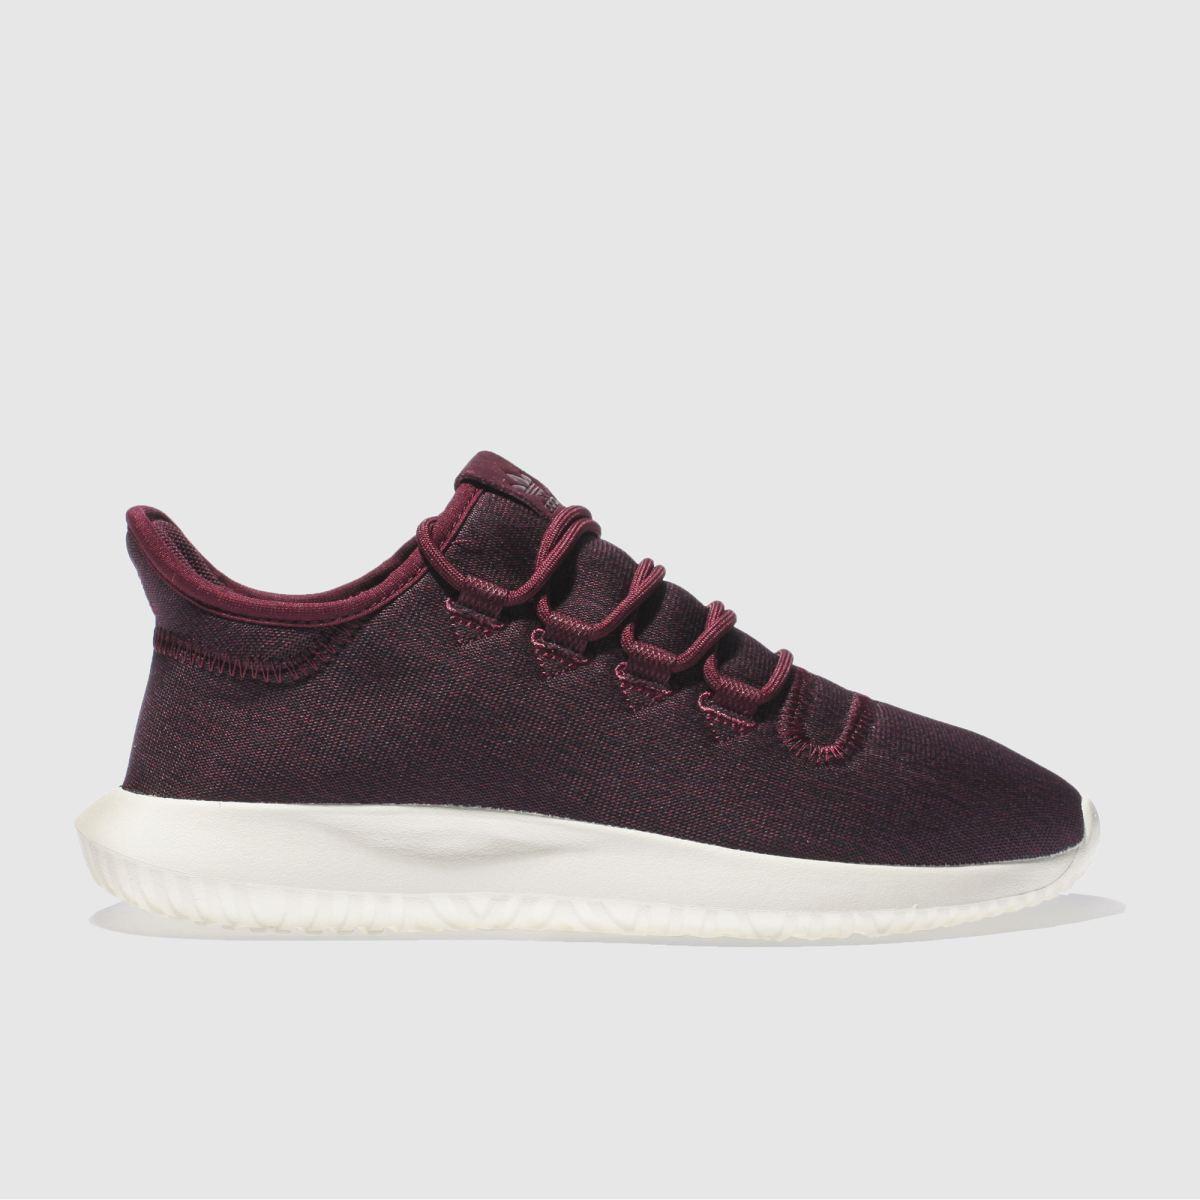 adidas burgundy tubular shadow trainers